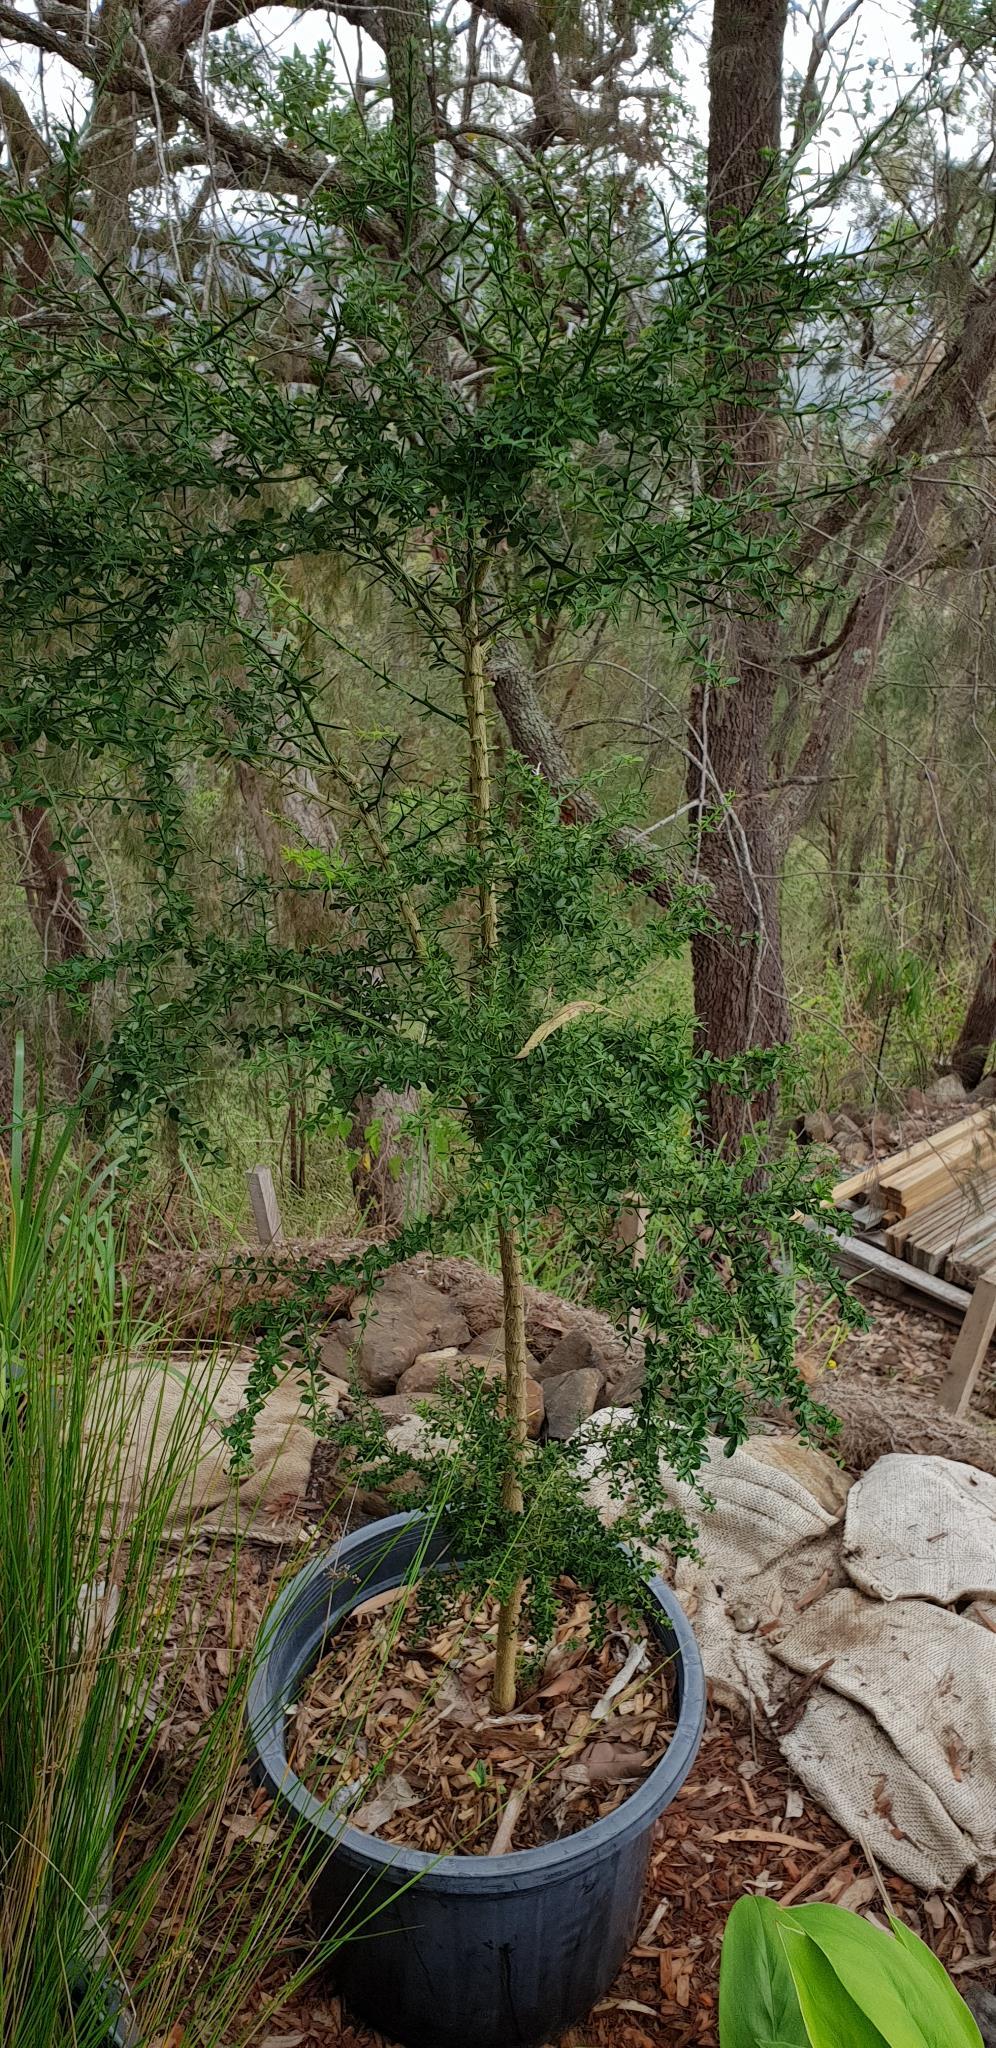 Native Round Lime - Citrus australis